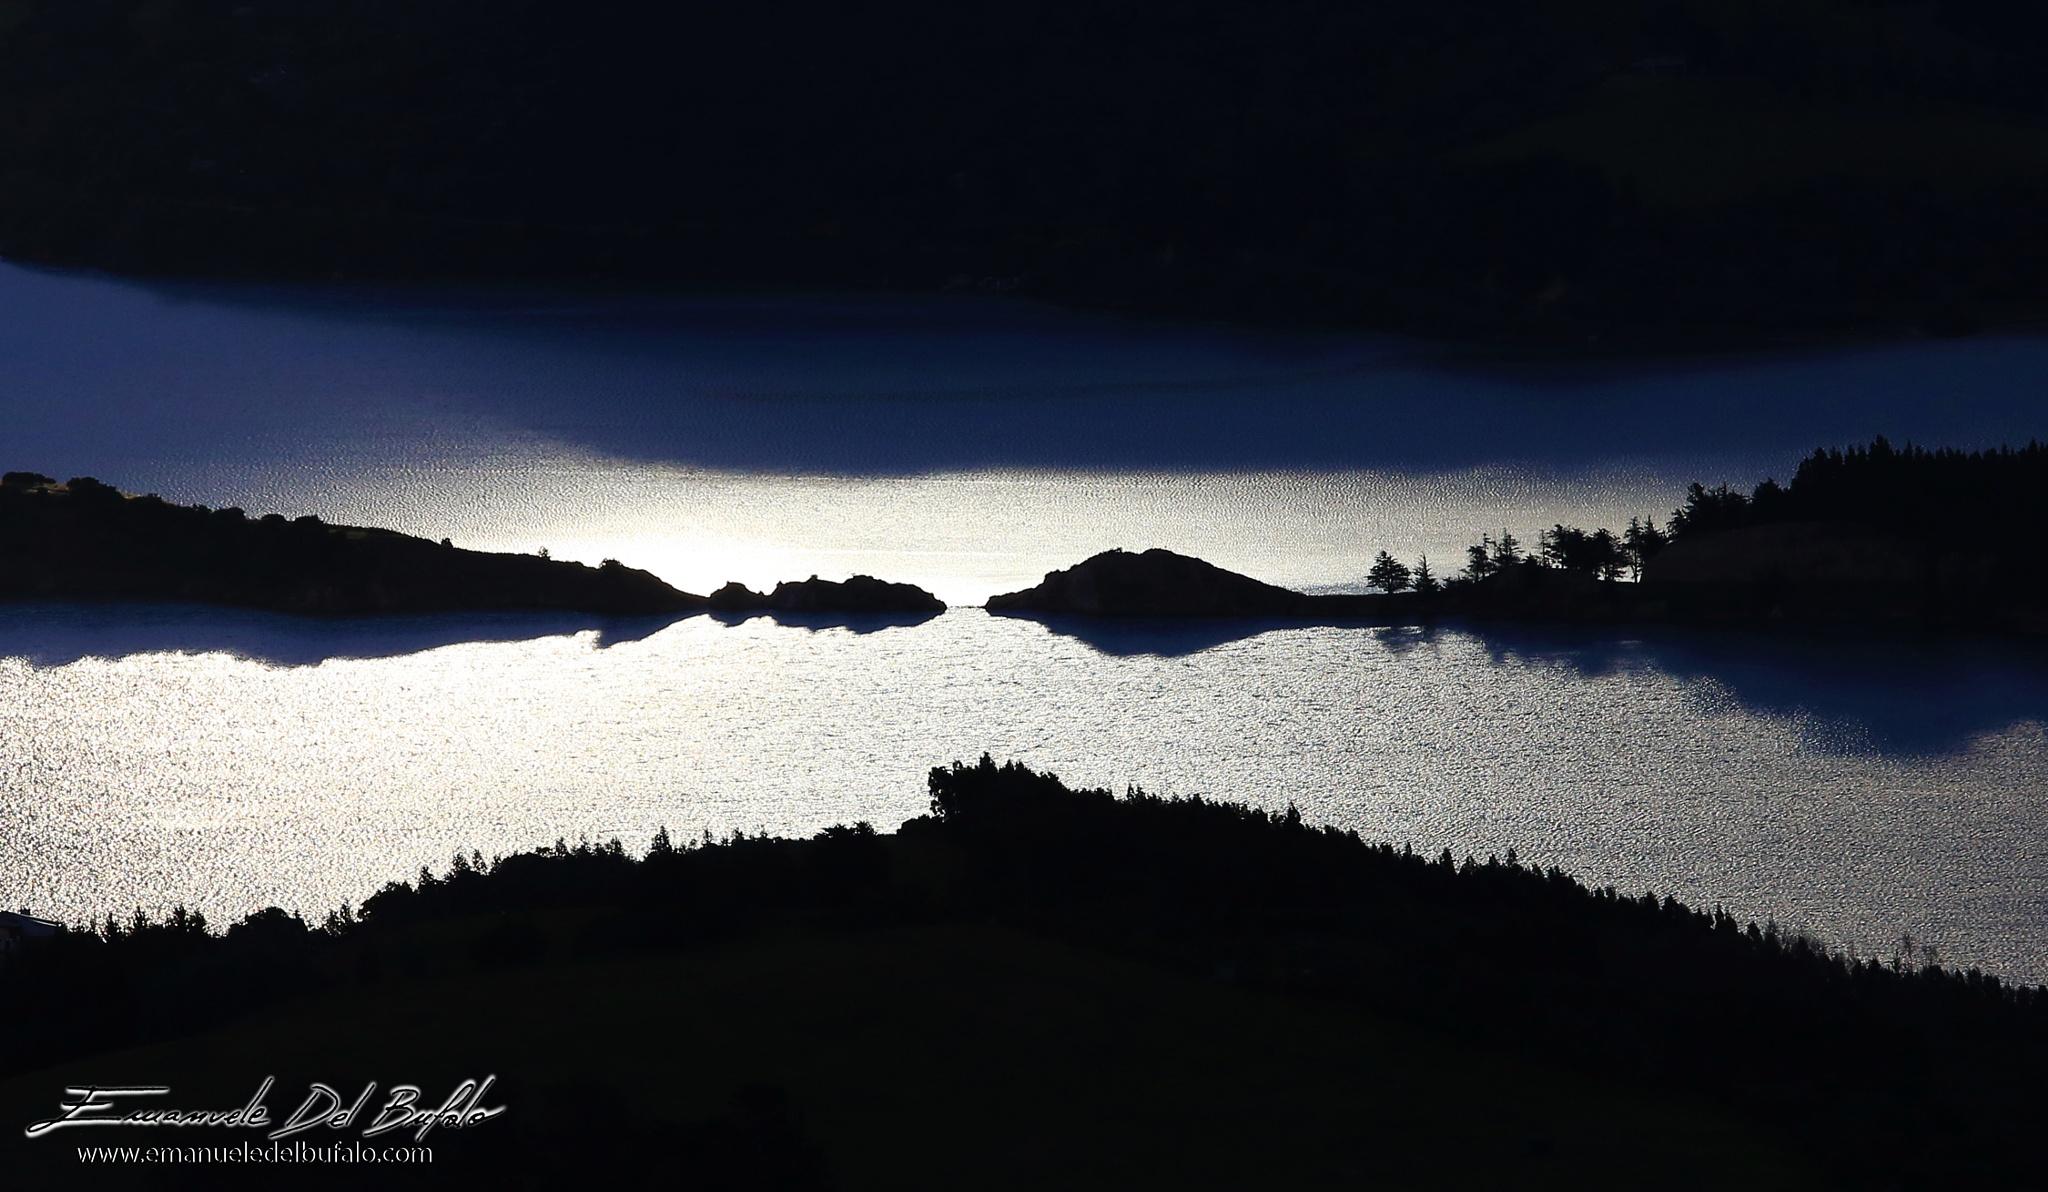 Sunset inside a Volcano by The Long Term Traveler